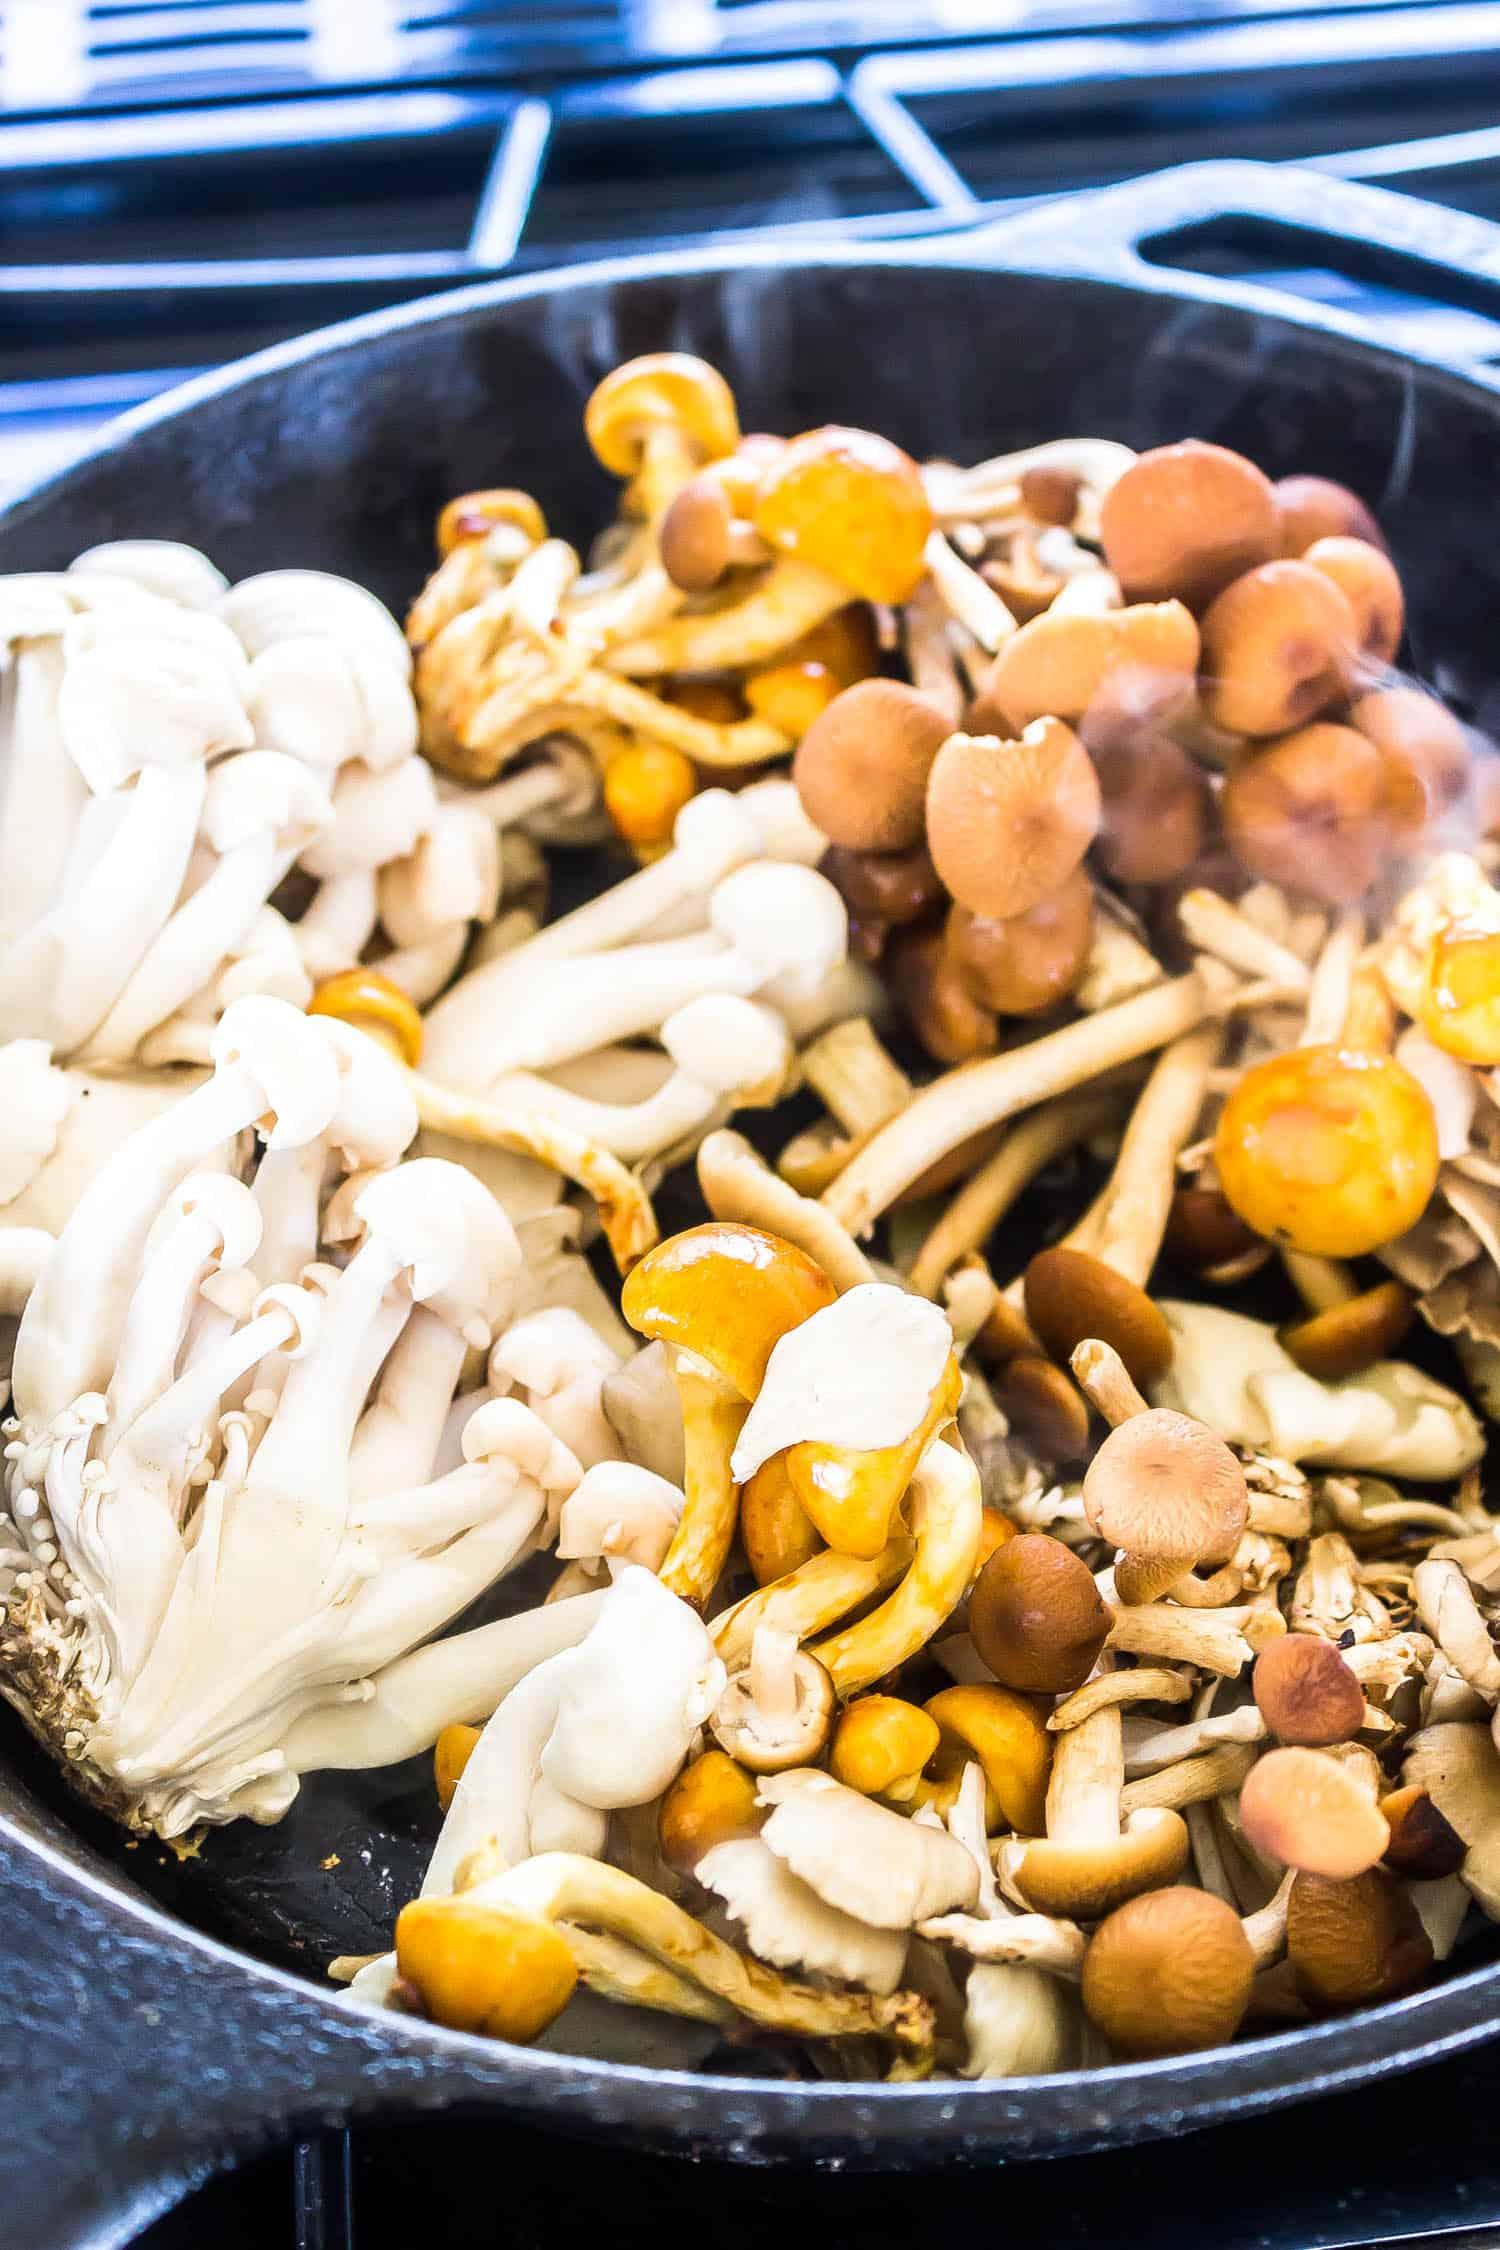 wild mushrooms in a cast iron skillet